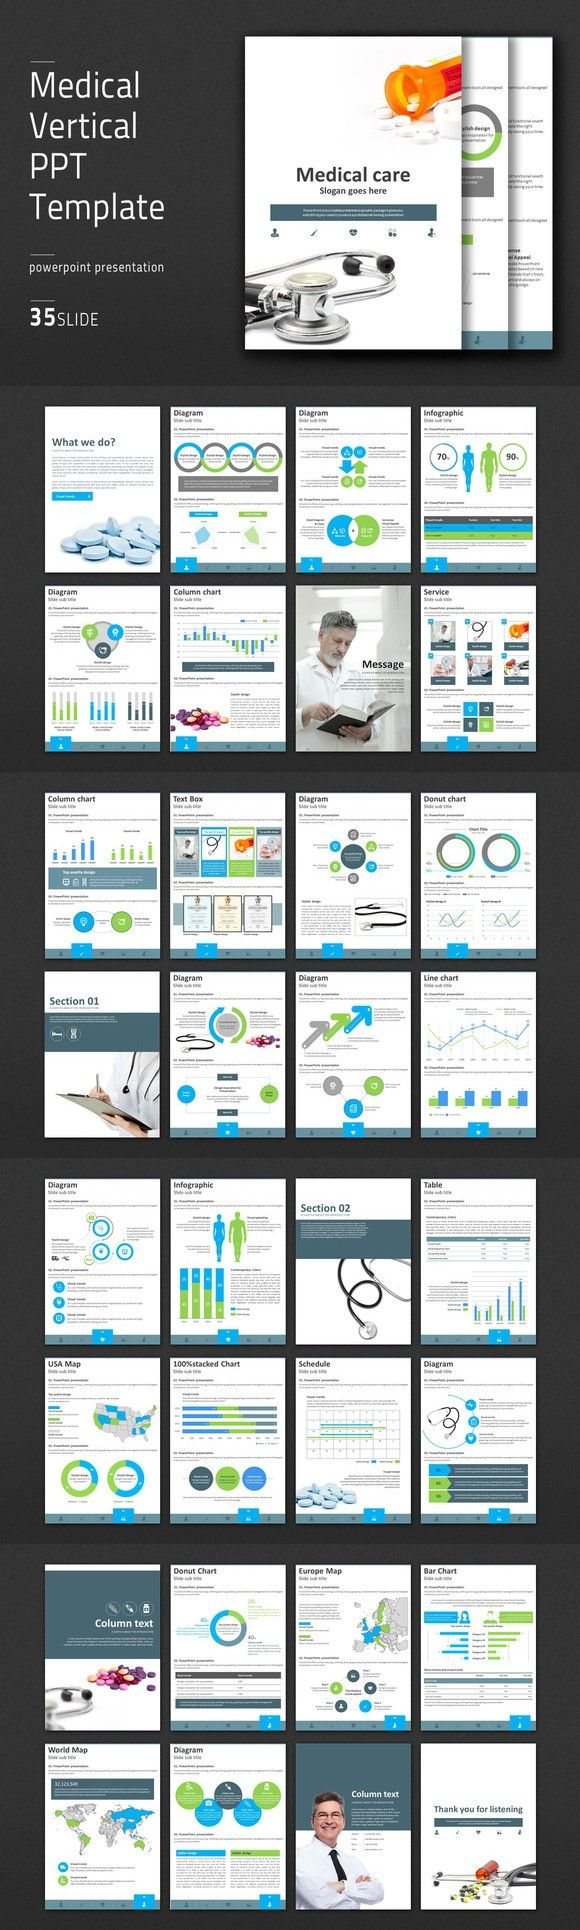 Medical vertical ppt template ppt template infographic and medical medical vertical ppt template medical infographic 4100 toneelgroepblik Gallery